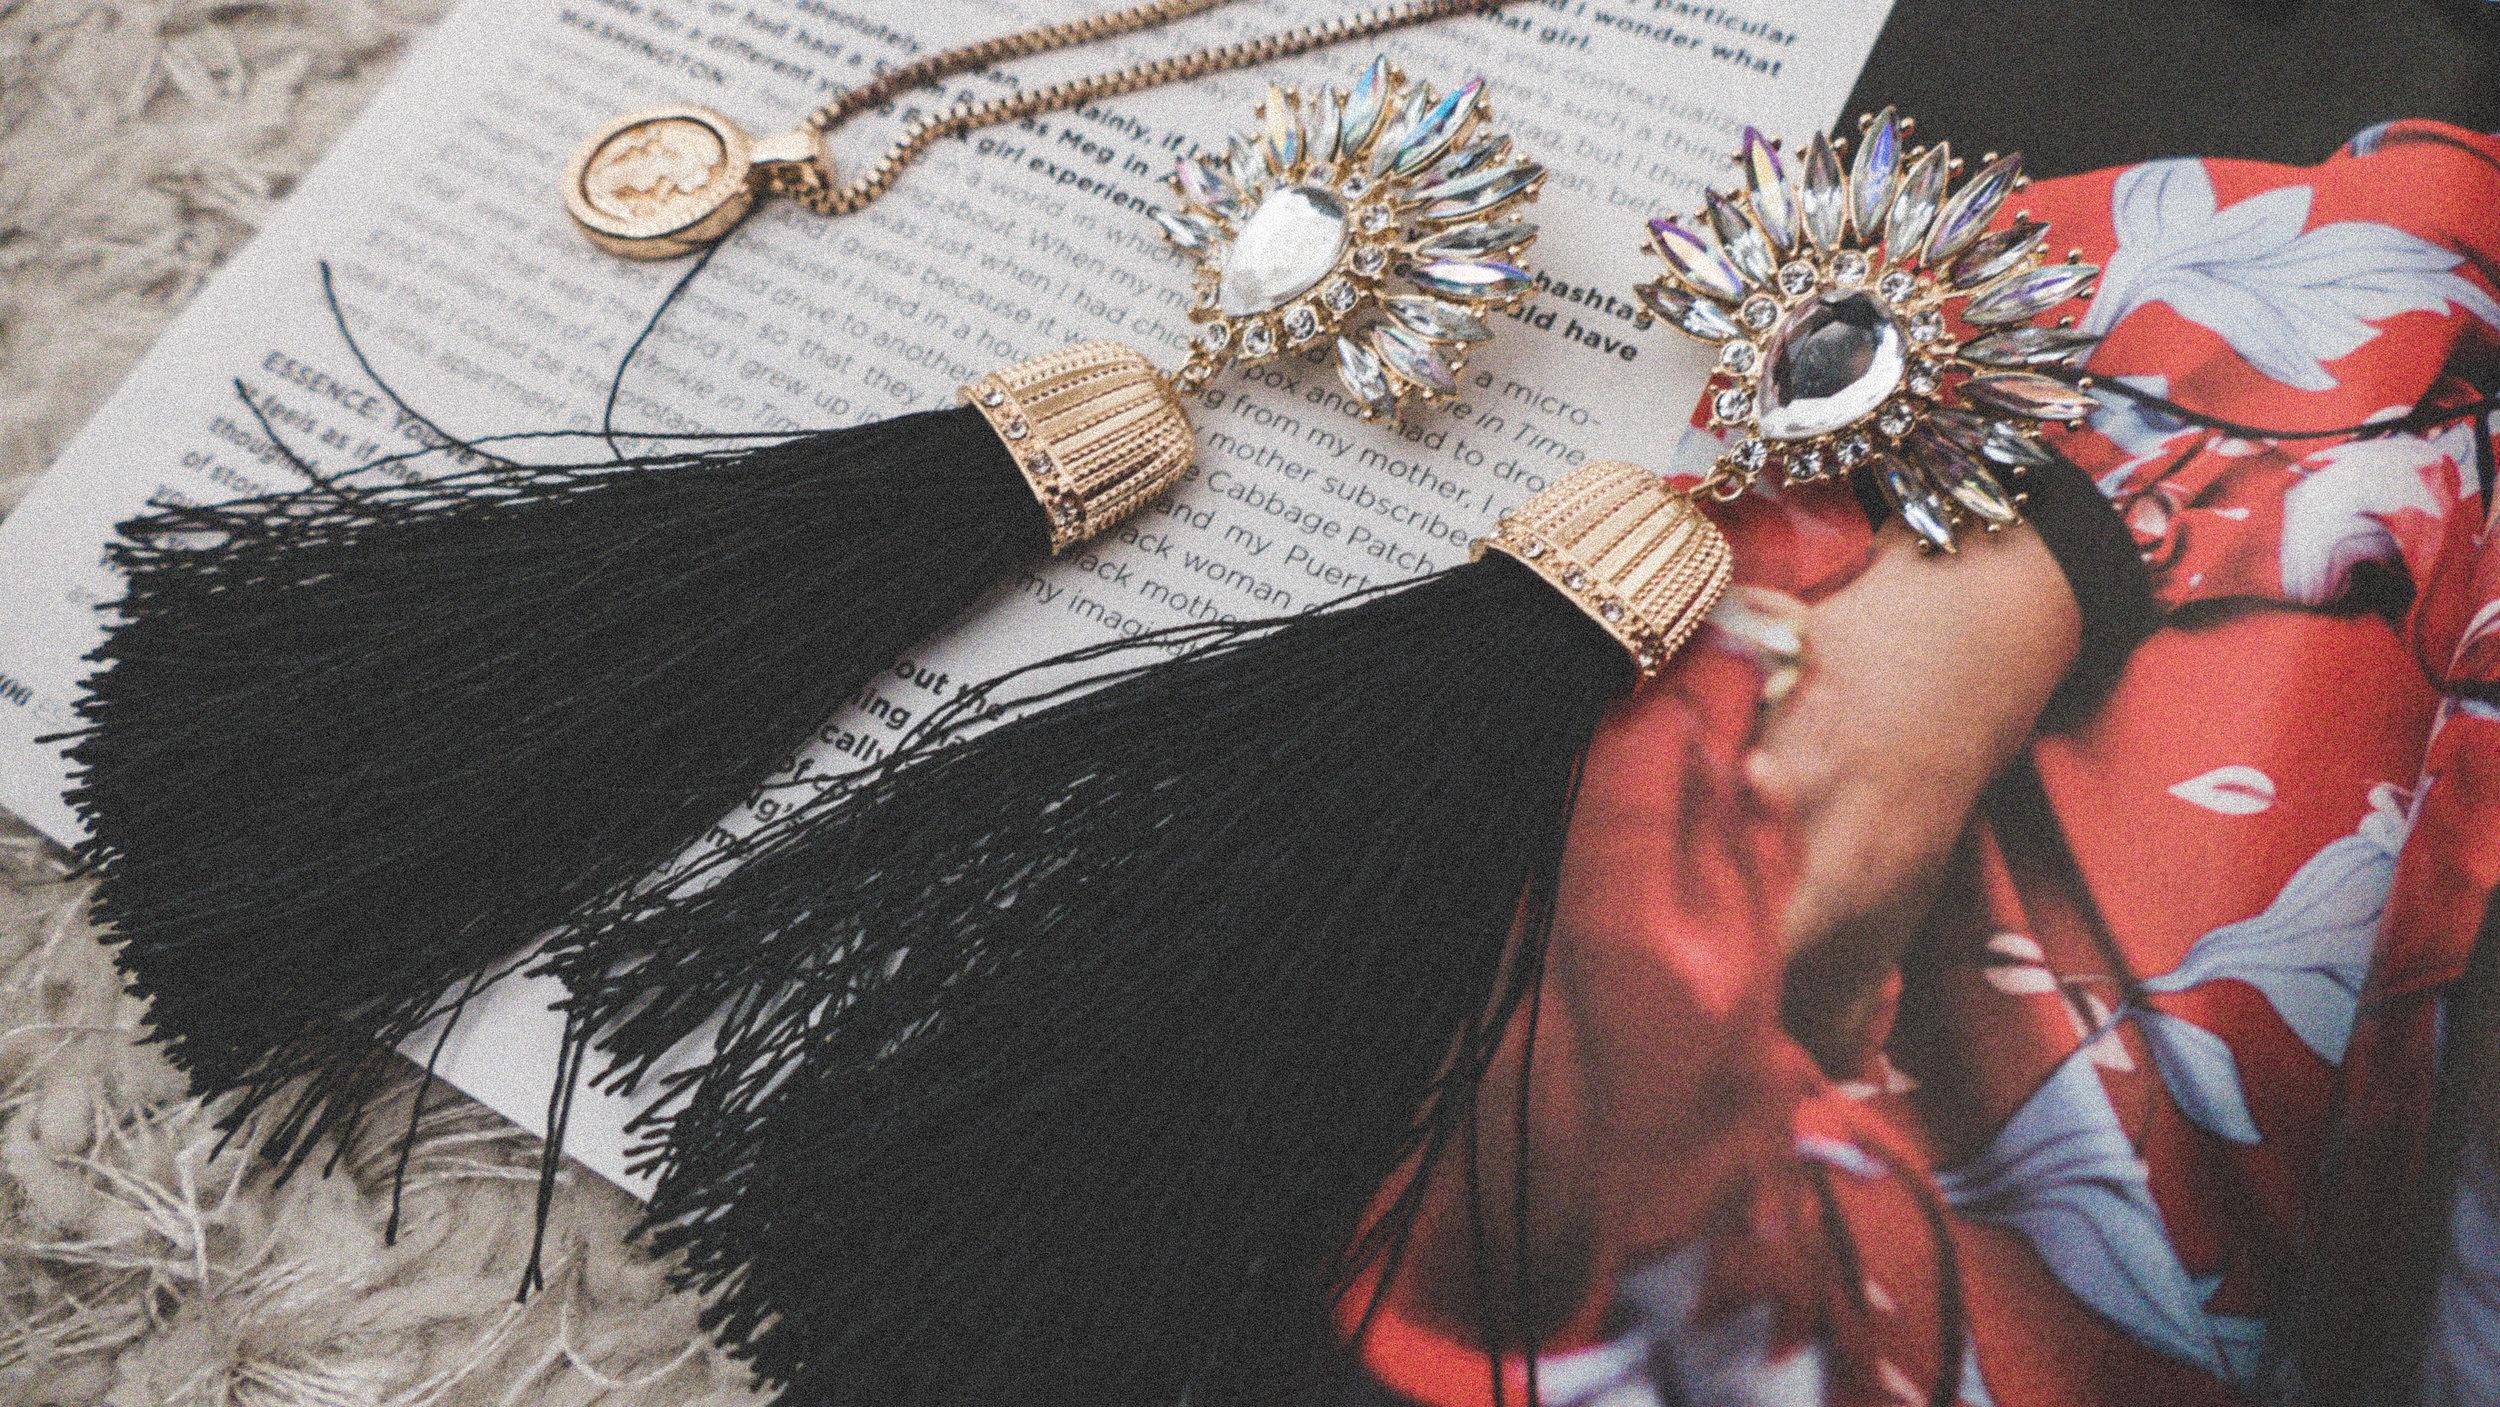 Tassel earrings stacked rings, rose gold watch, accessories